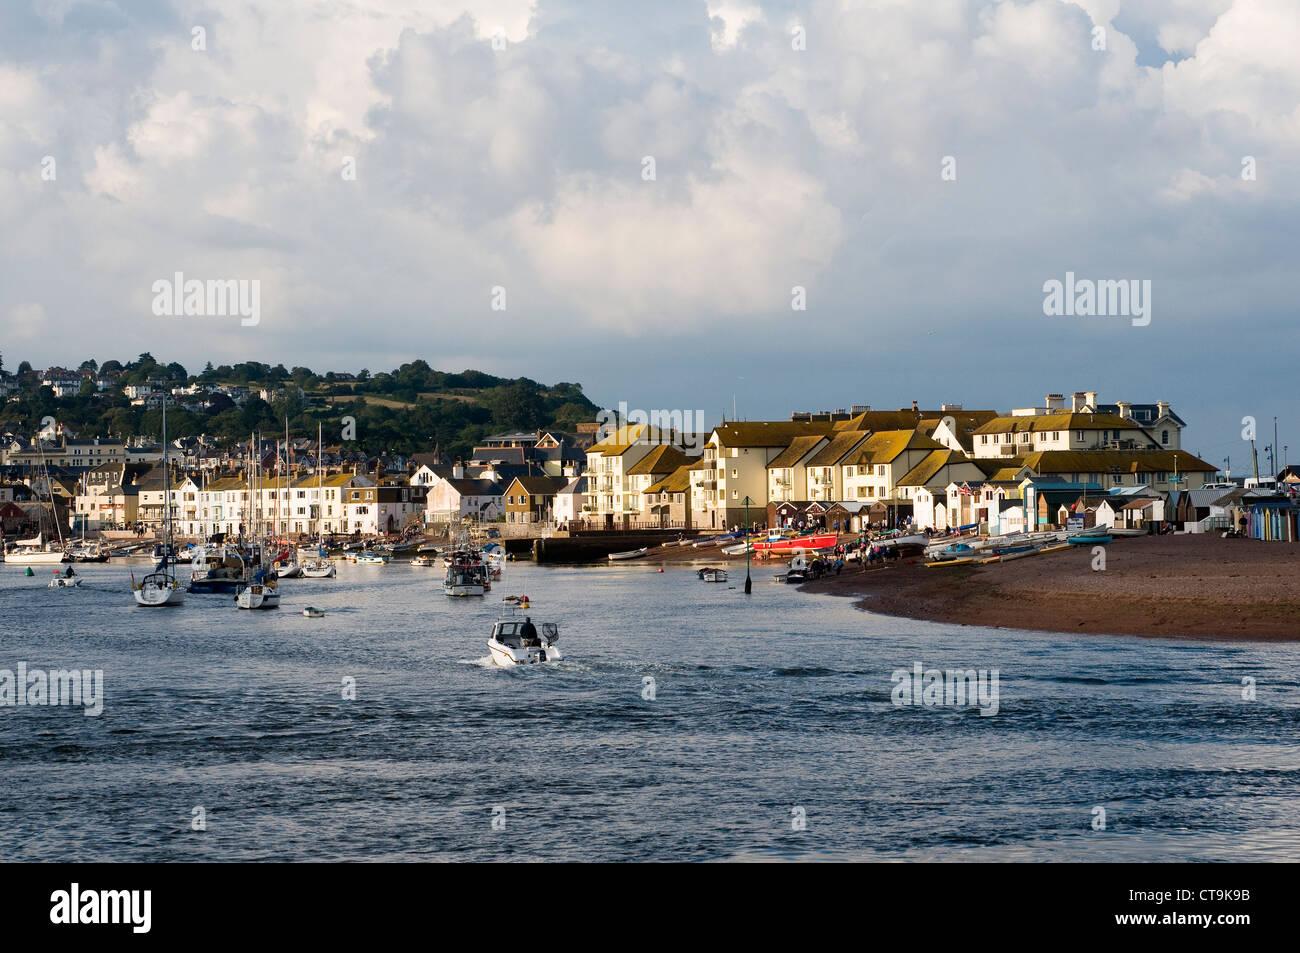 Back Beach,Teignmouth,Devon, devon, dinghy, fish, fisherman, houses, keel, low, pier, reflect, reflection, river, - Stock Image